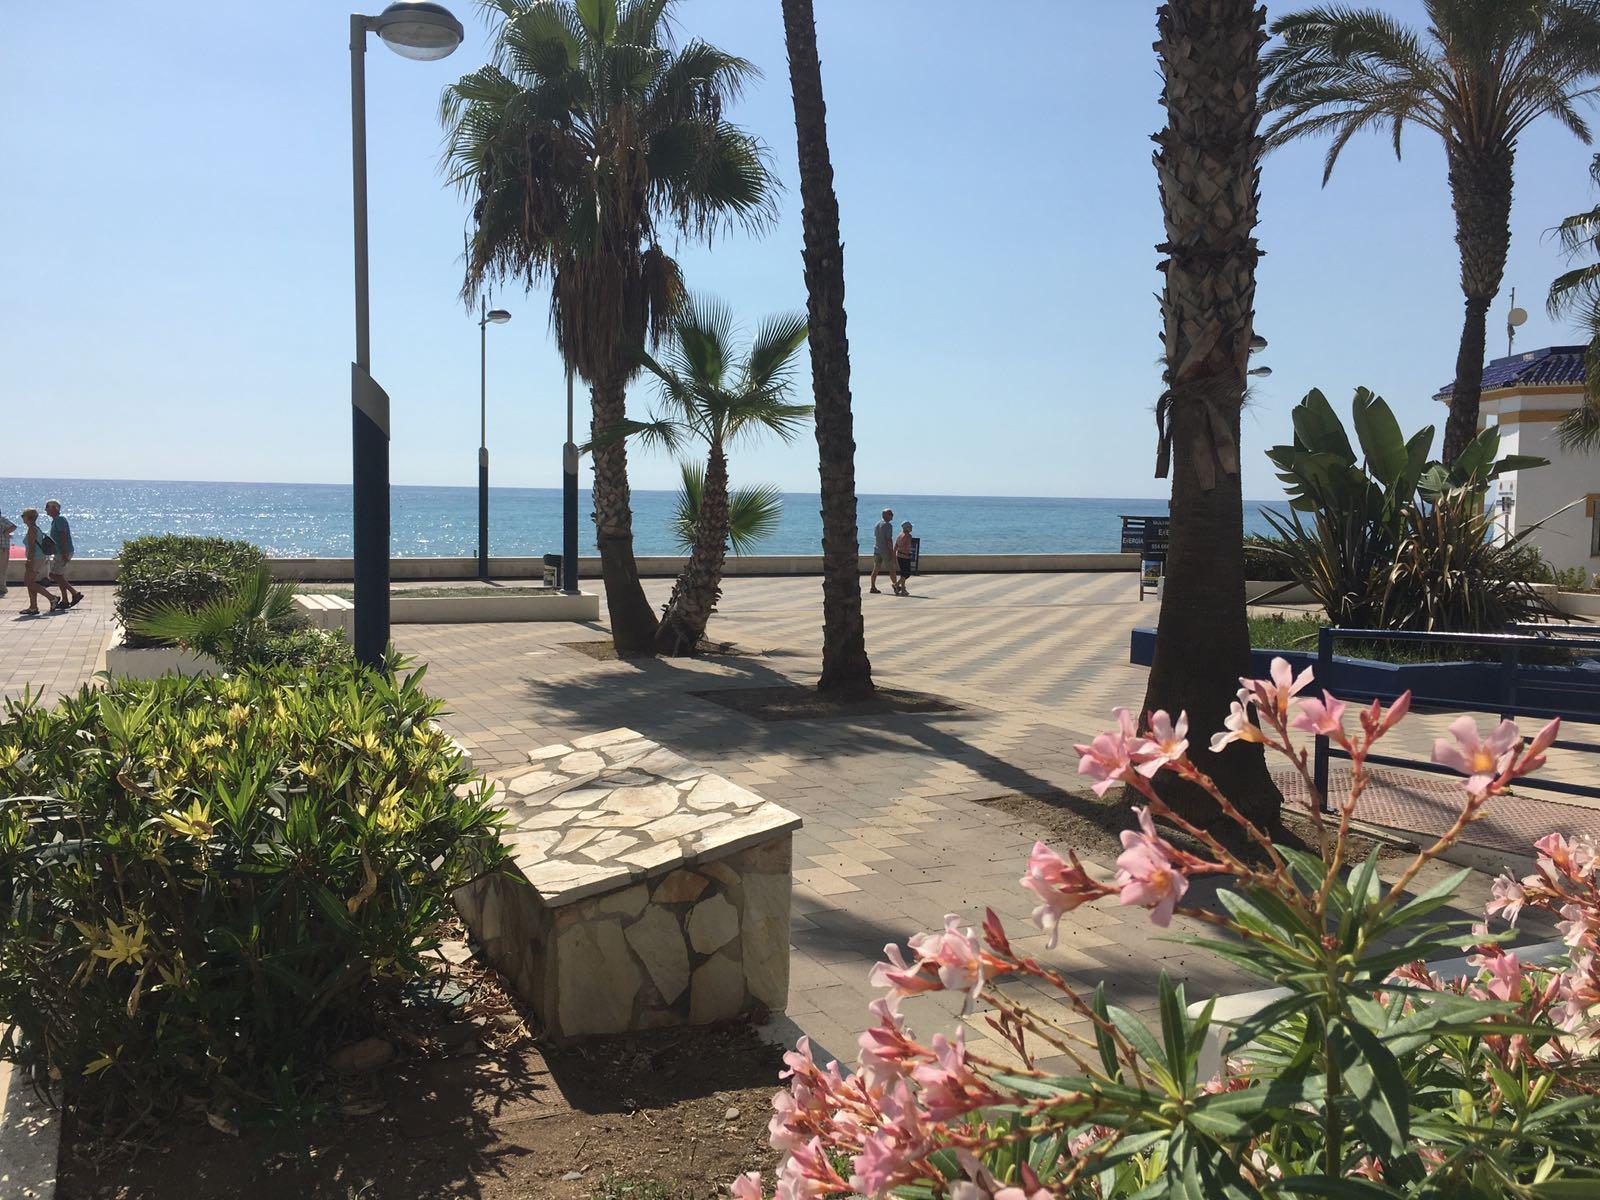 Ferienwohnung Studio Torrox Costa Andalusien malaga (2471559), Torrox, Costa del Sol, Andalusien, Spanien, Bild 27